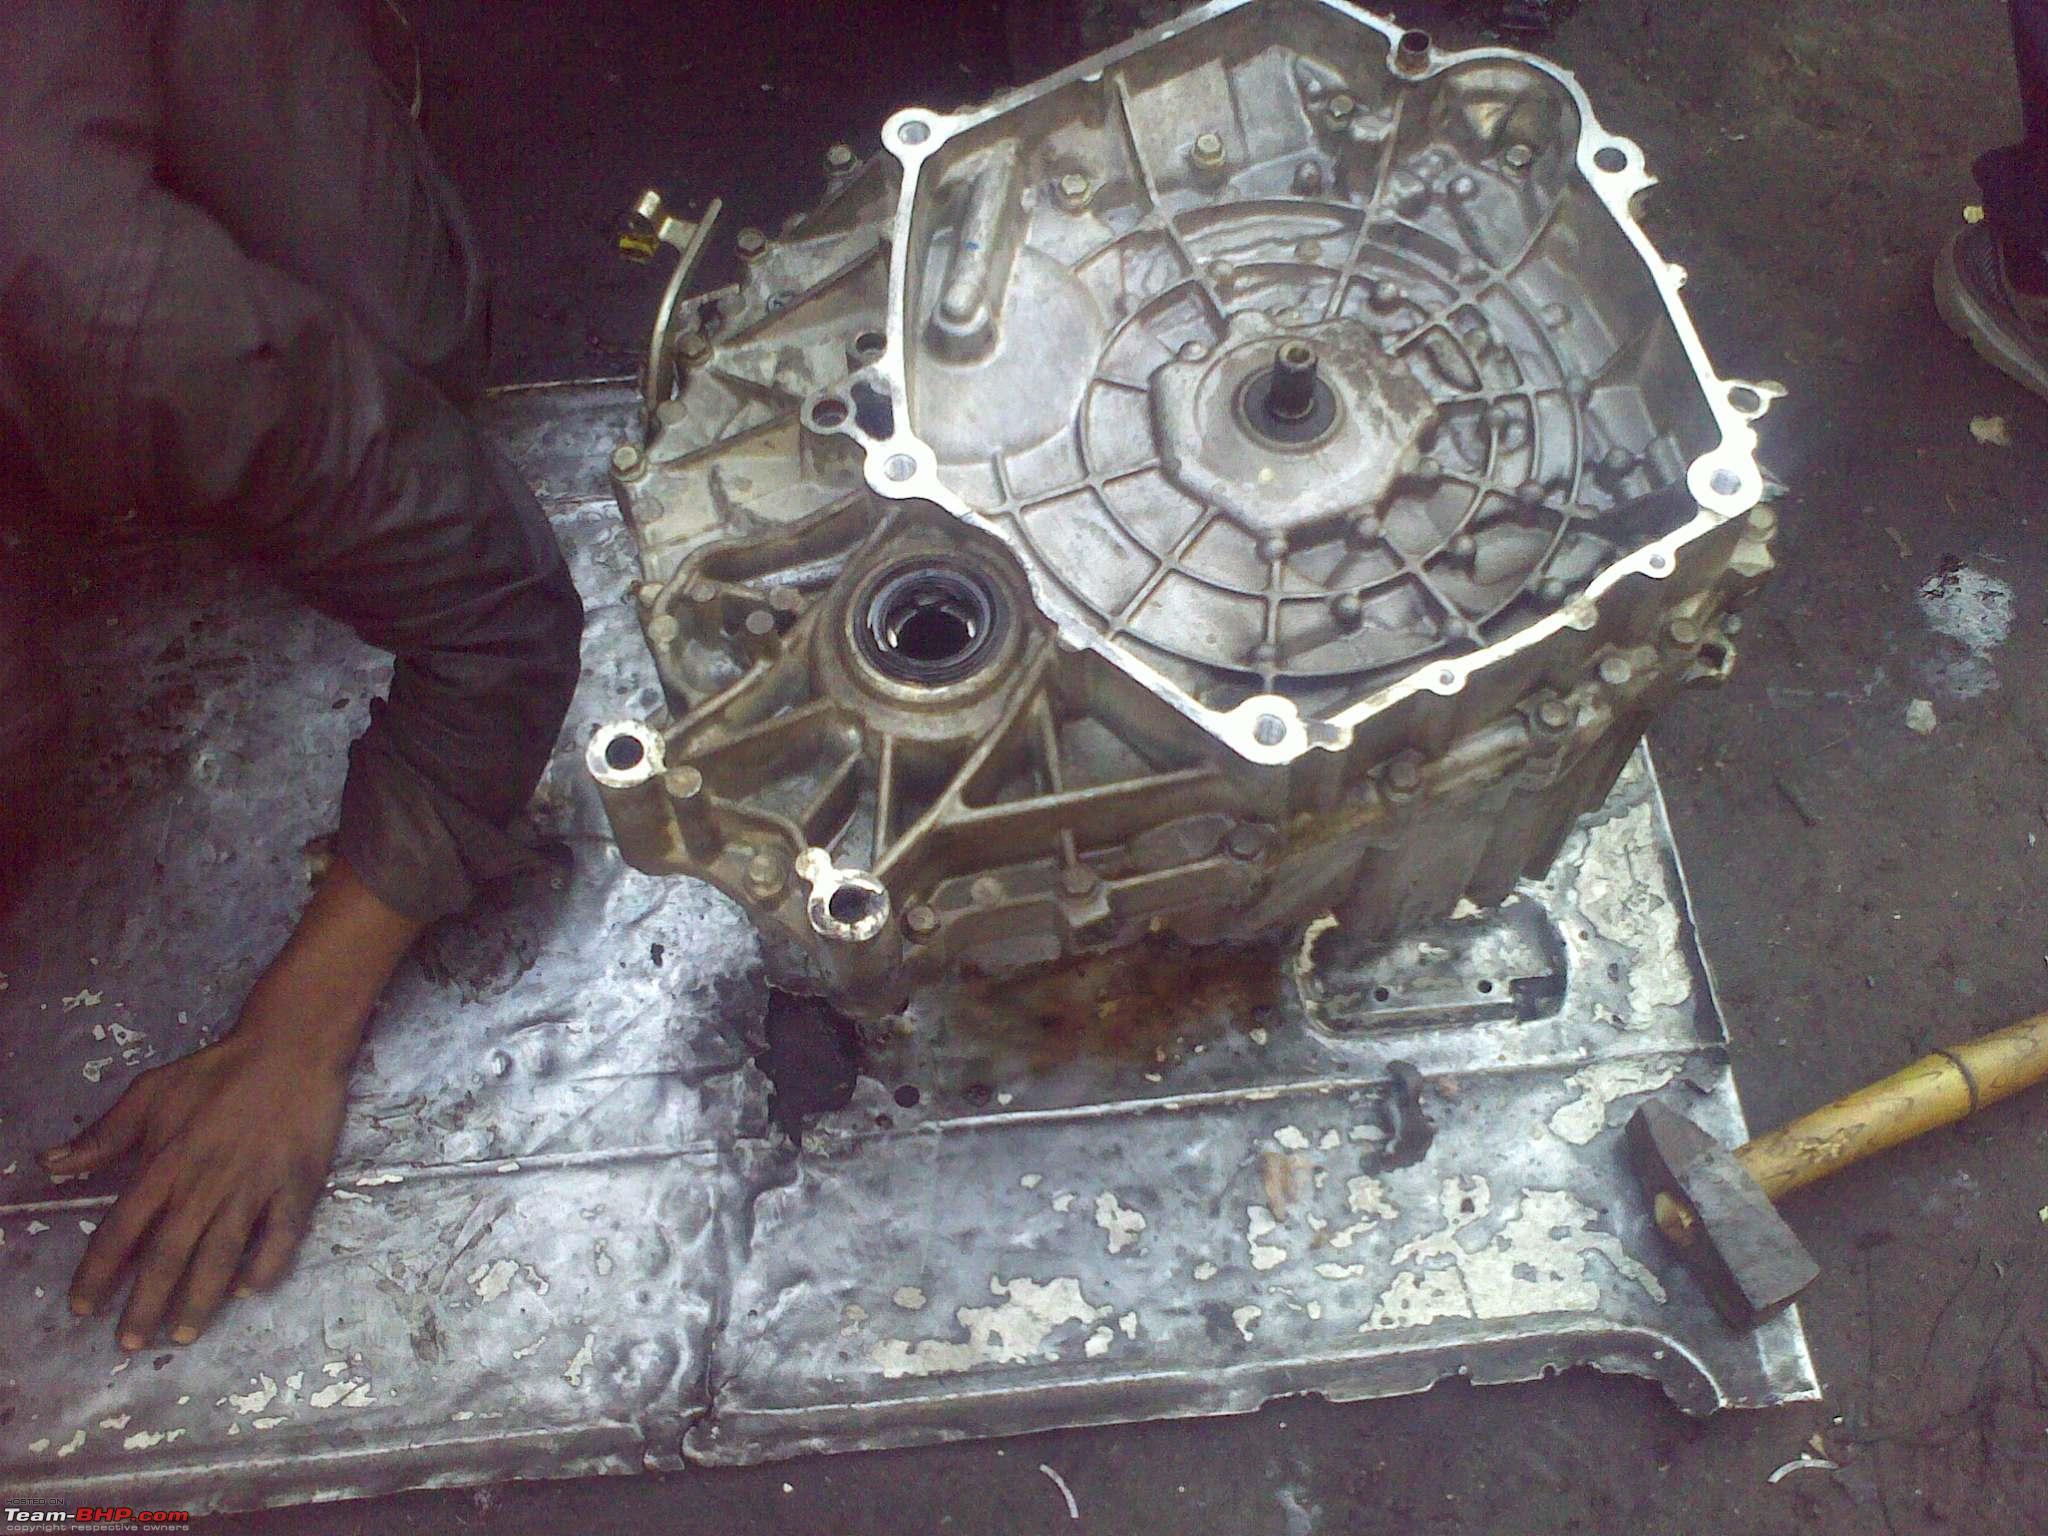 PICS : Overhauling a Honda City CVT transmission - Team-BHP